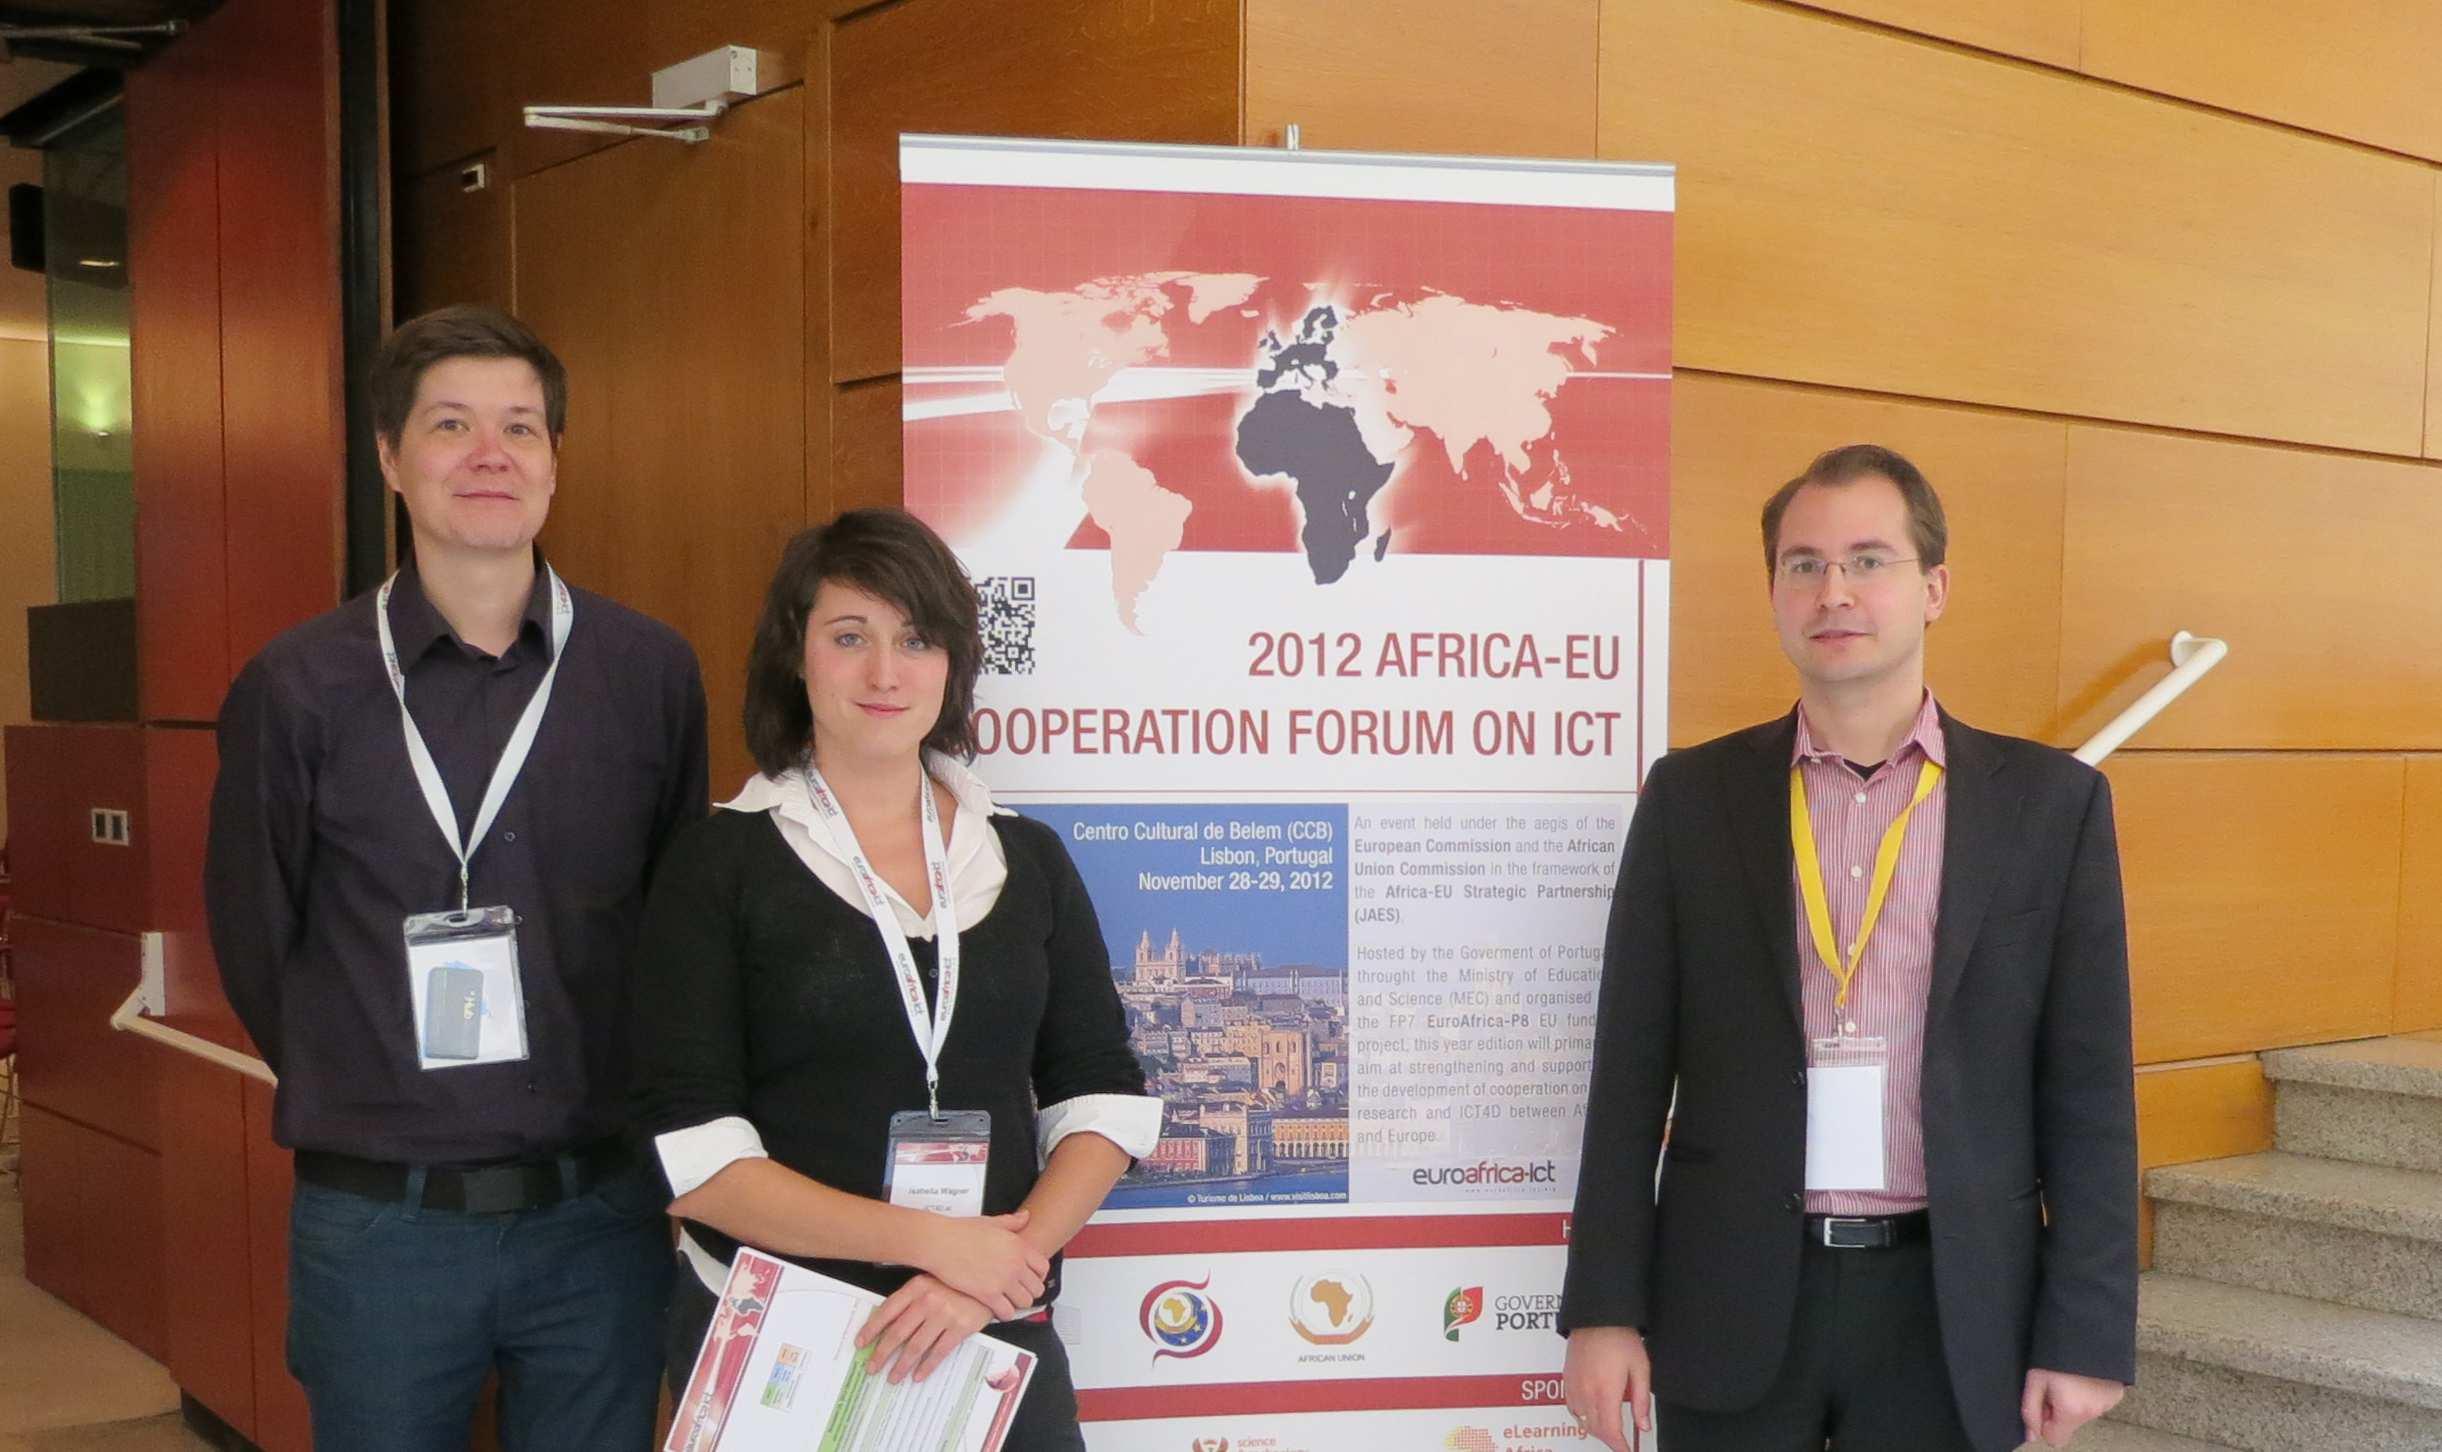 ICT4D.at @ 2012 Africa-EU Cooperation Forum on ICT